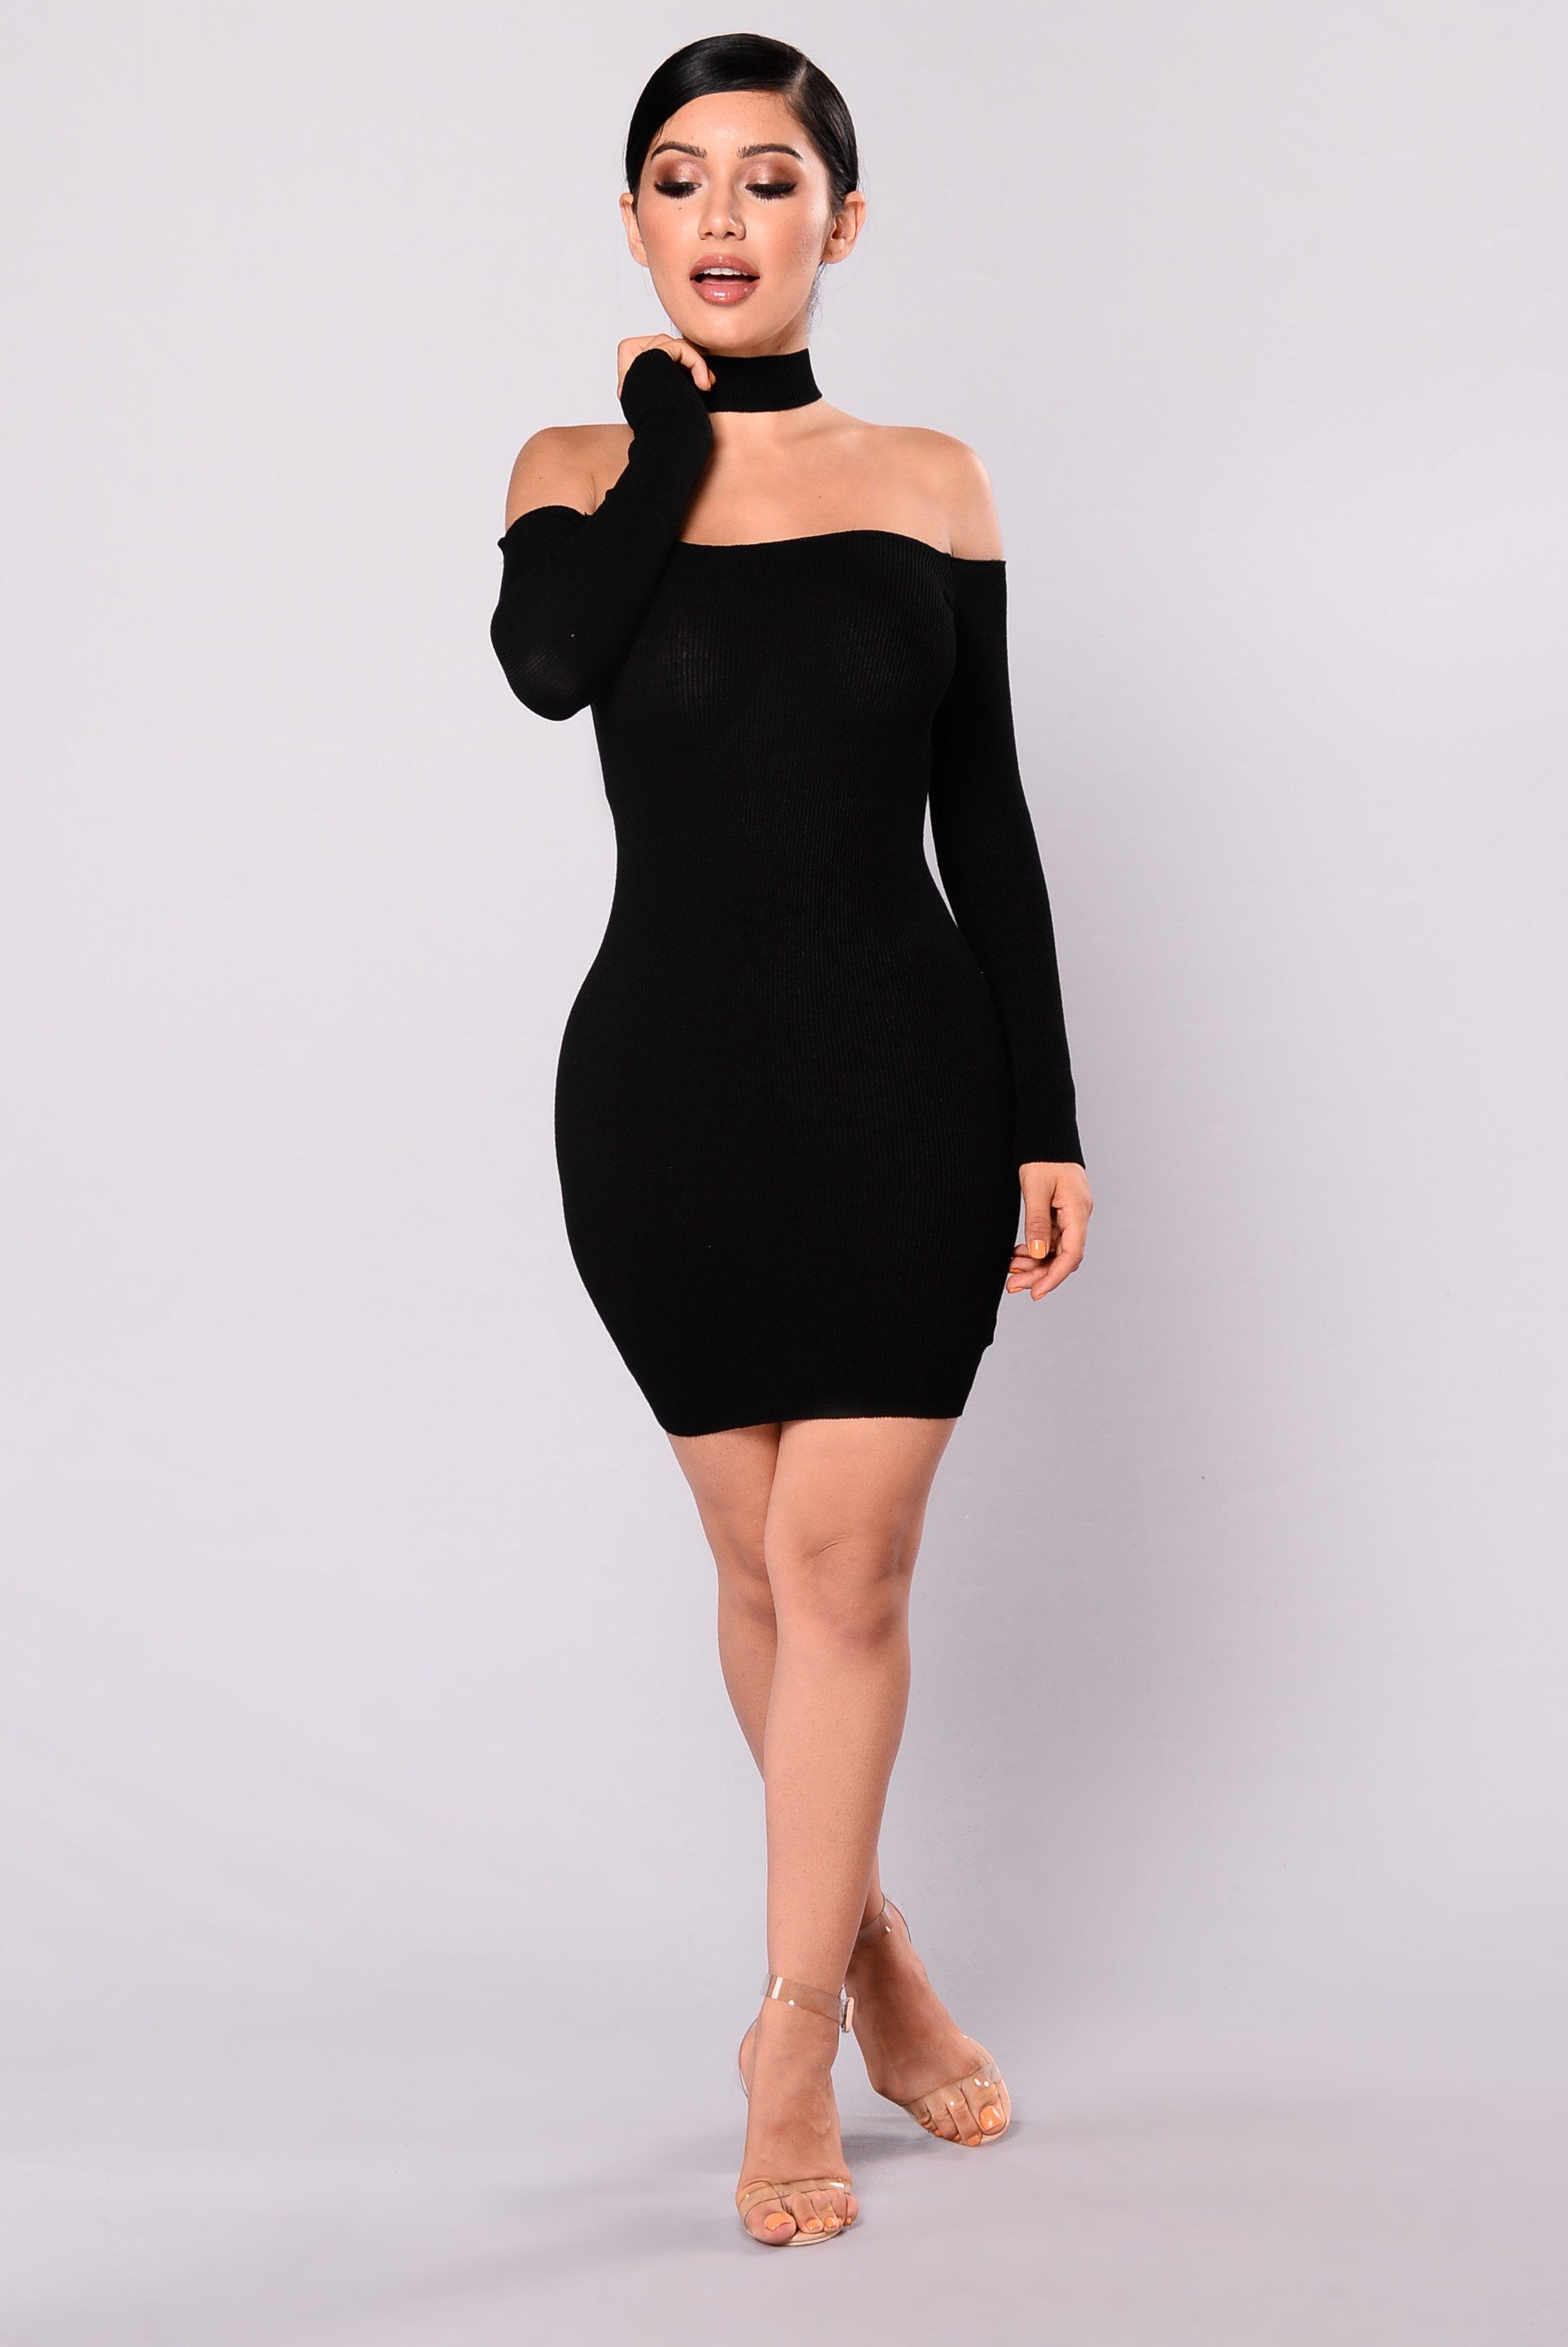 750b2568cf9 Image result for fashion nova black short dress